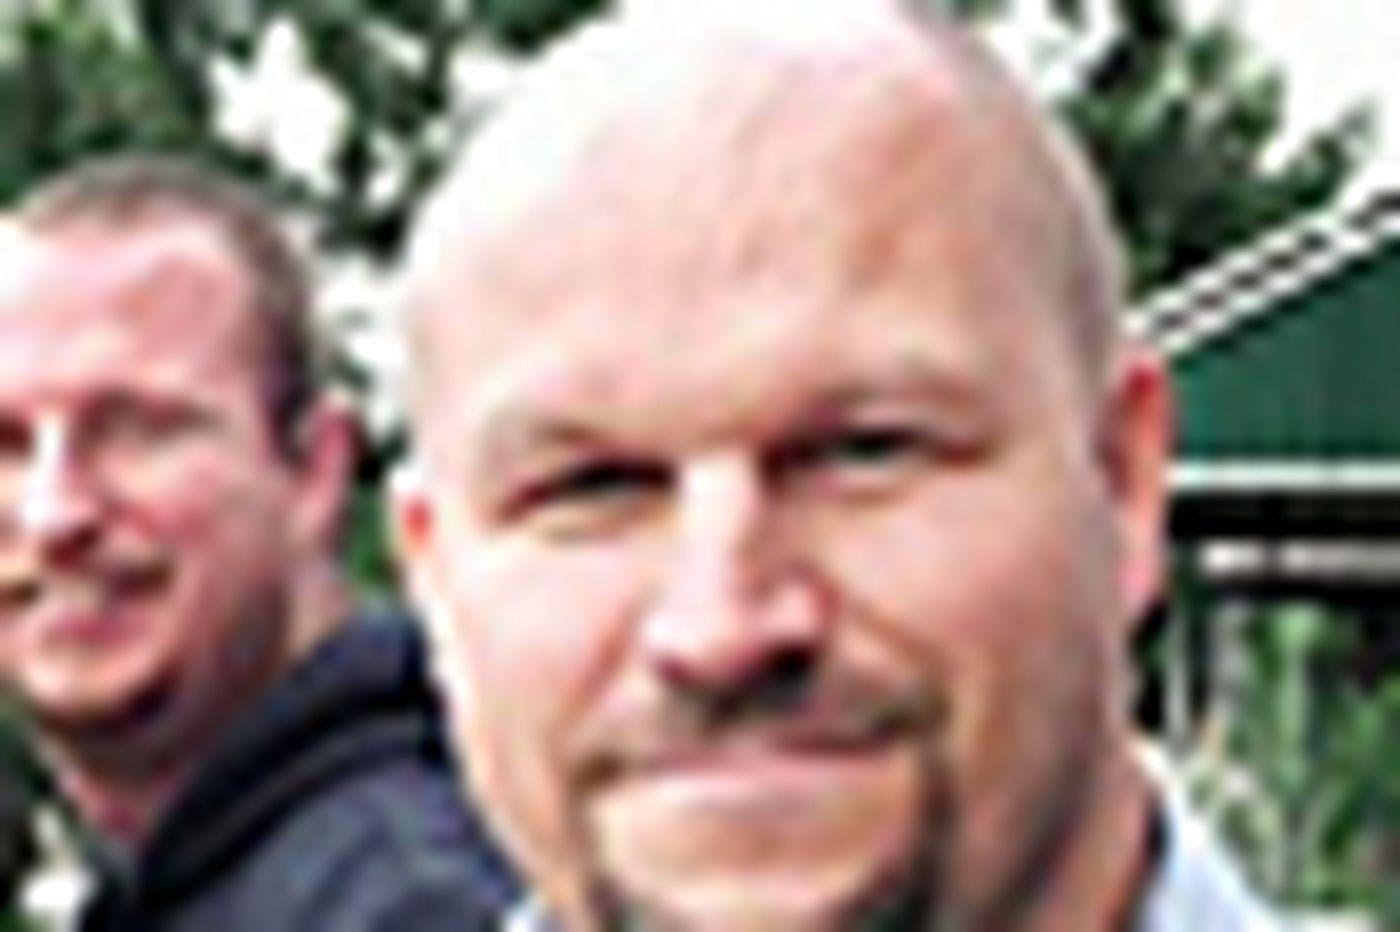 CHILLIN' WIT: Mayfair Town Watch President Milt Martelack